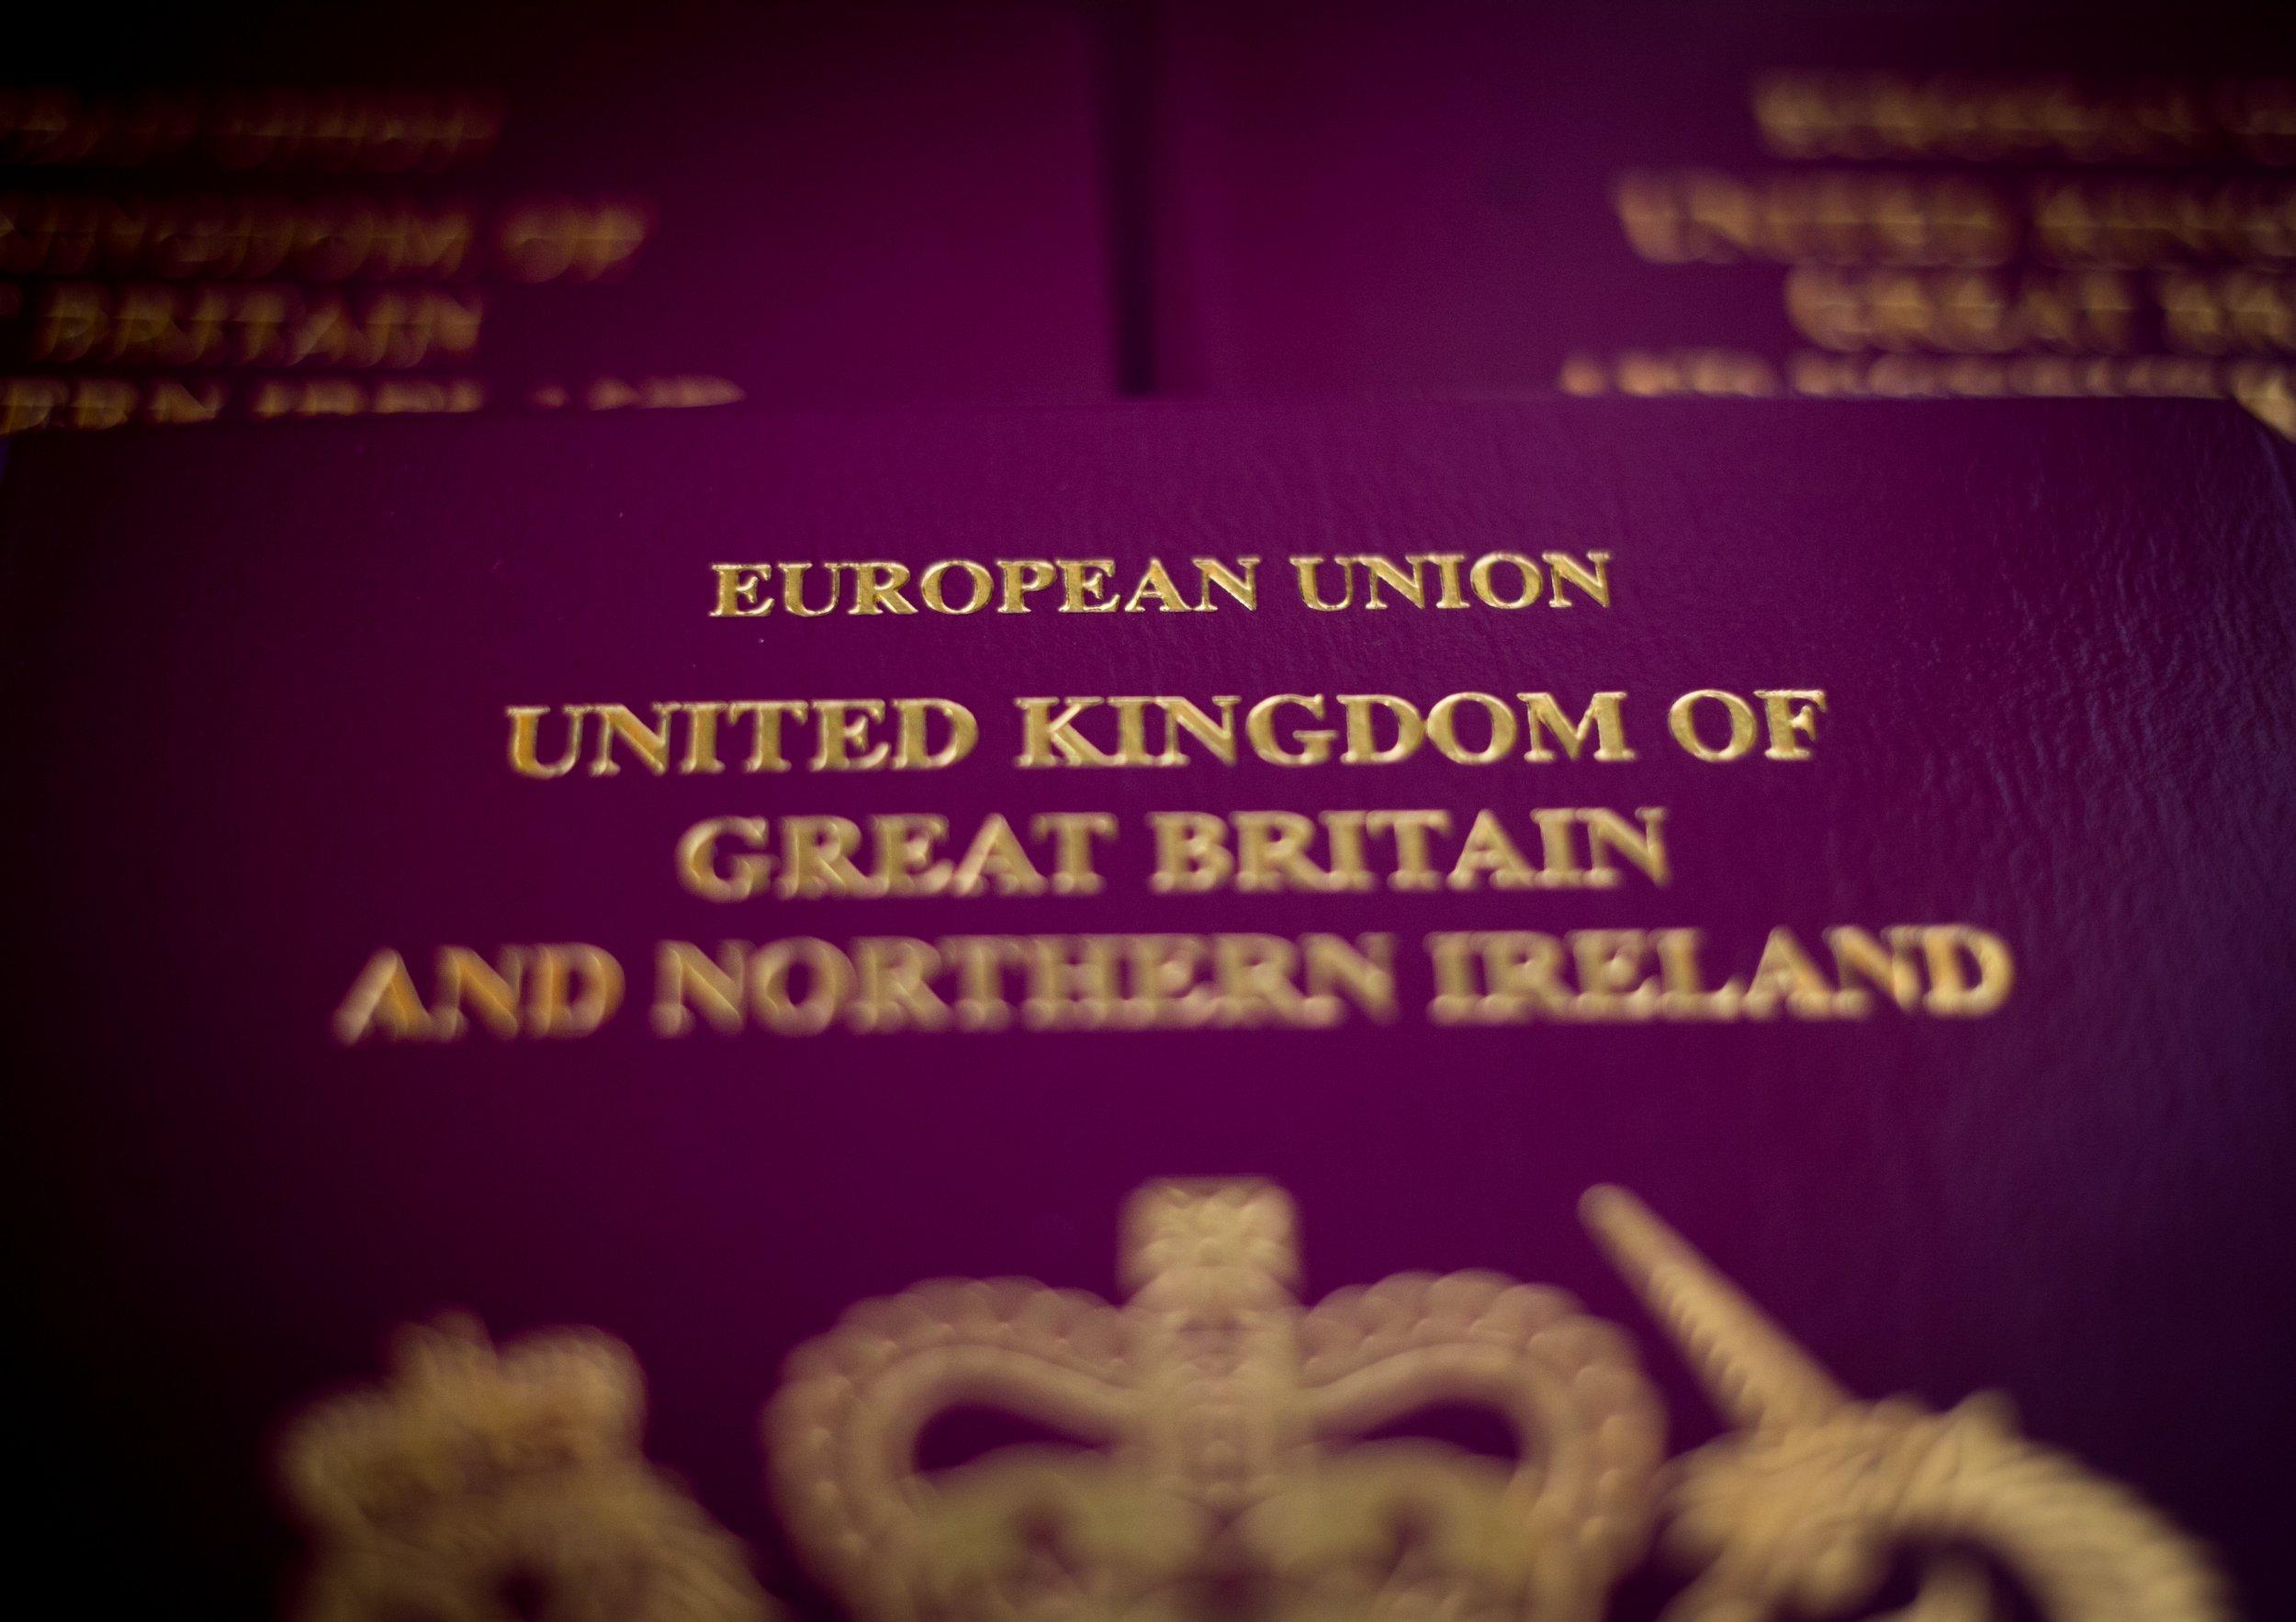 British PM Theresa May Backs Hospital Passport Checks on Pregnant Women